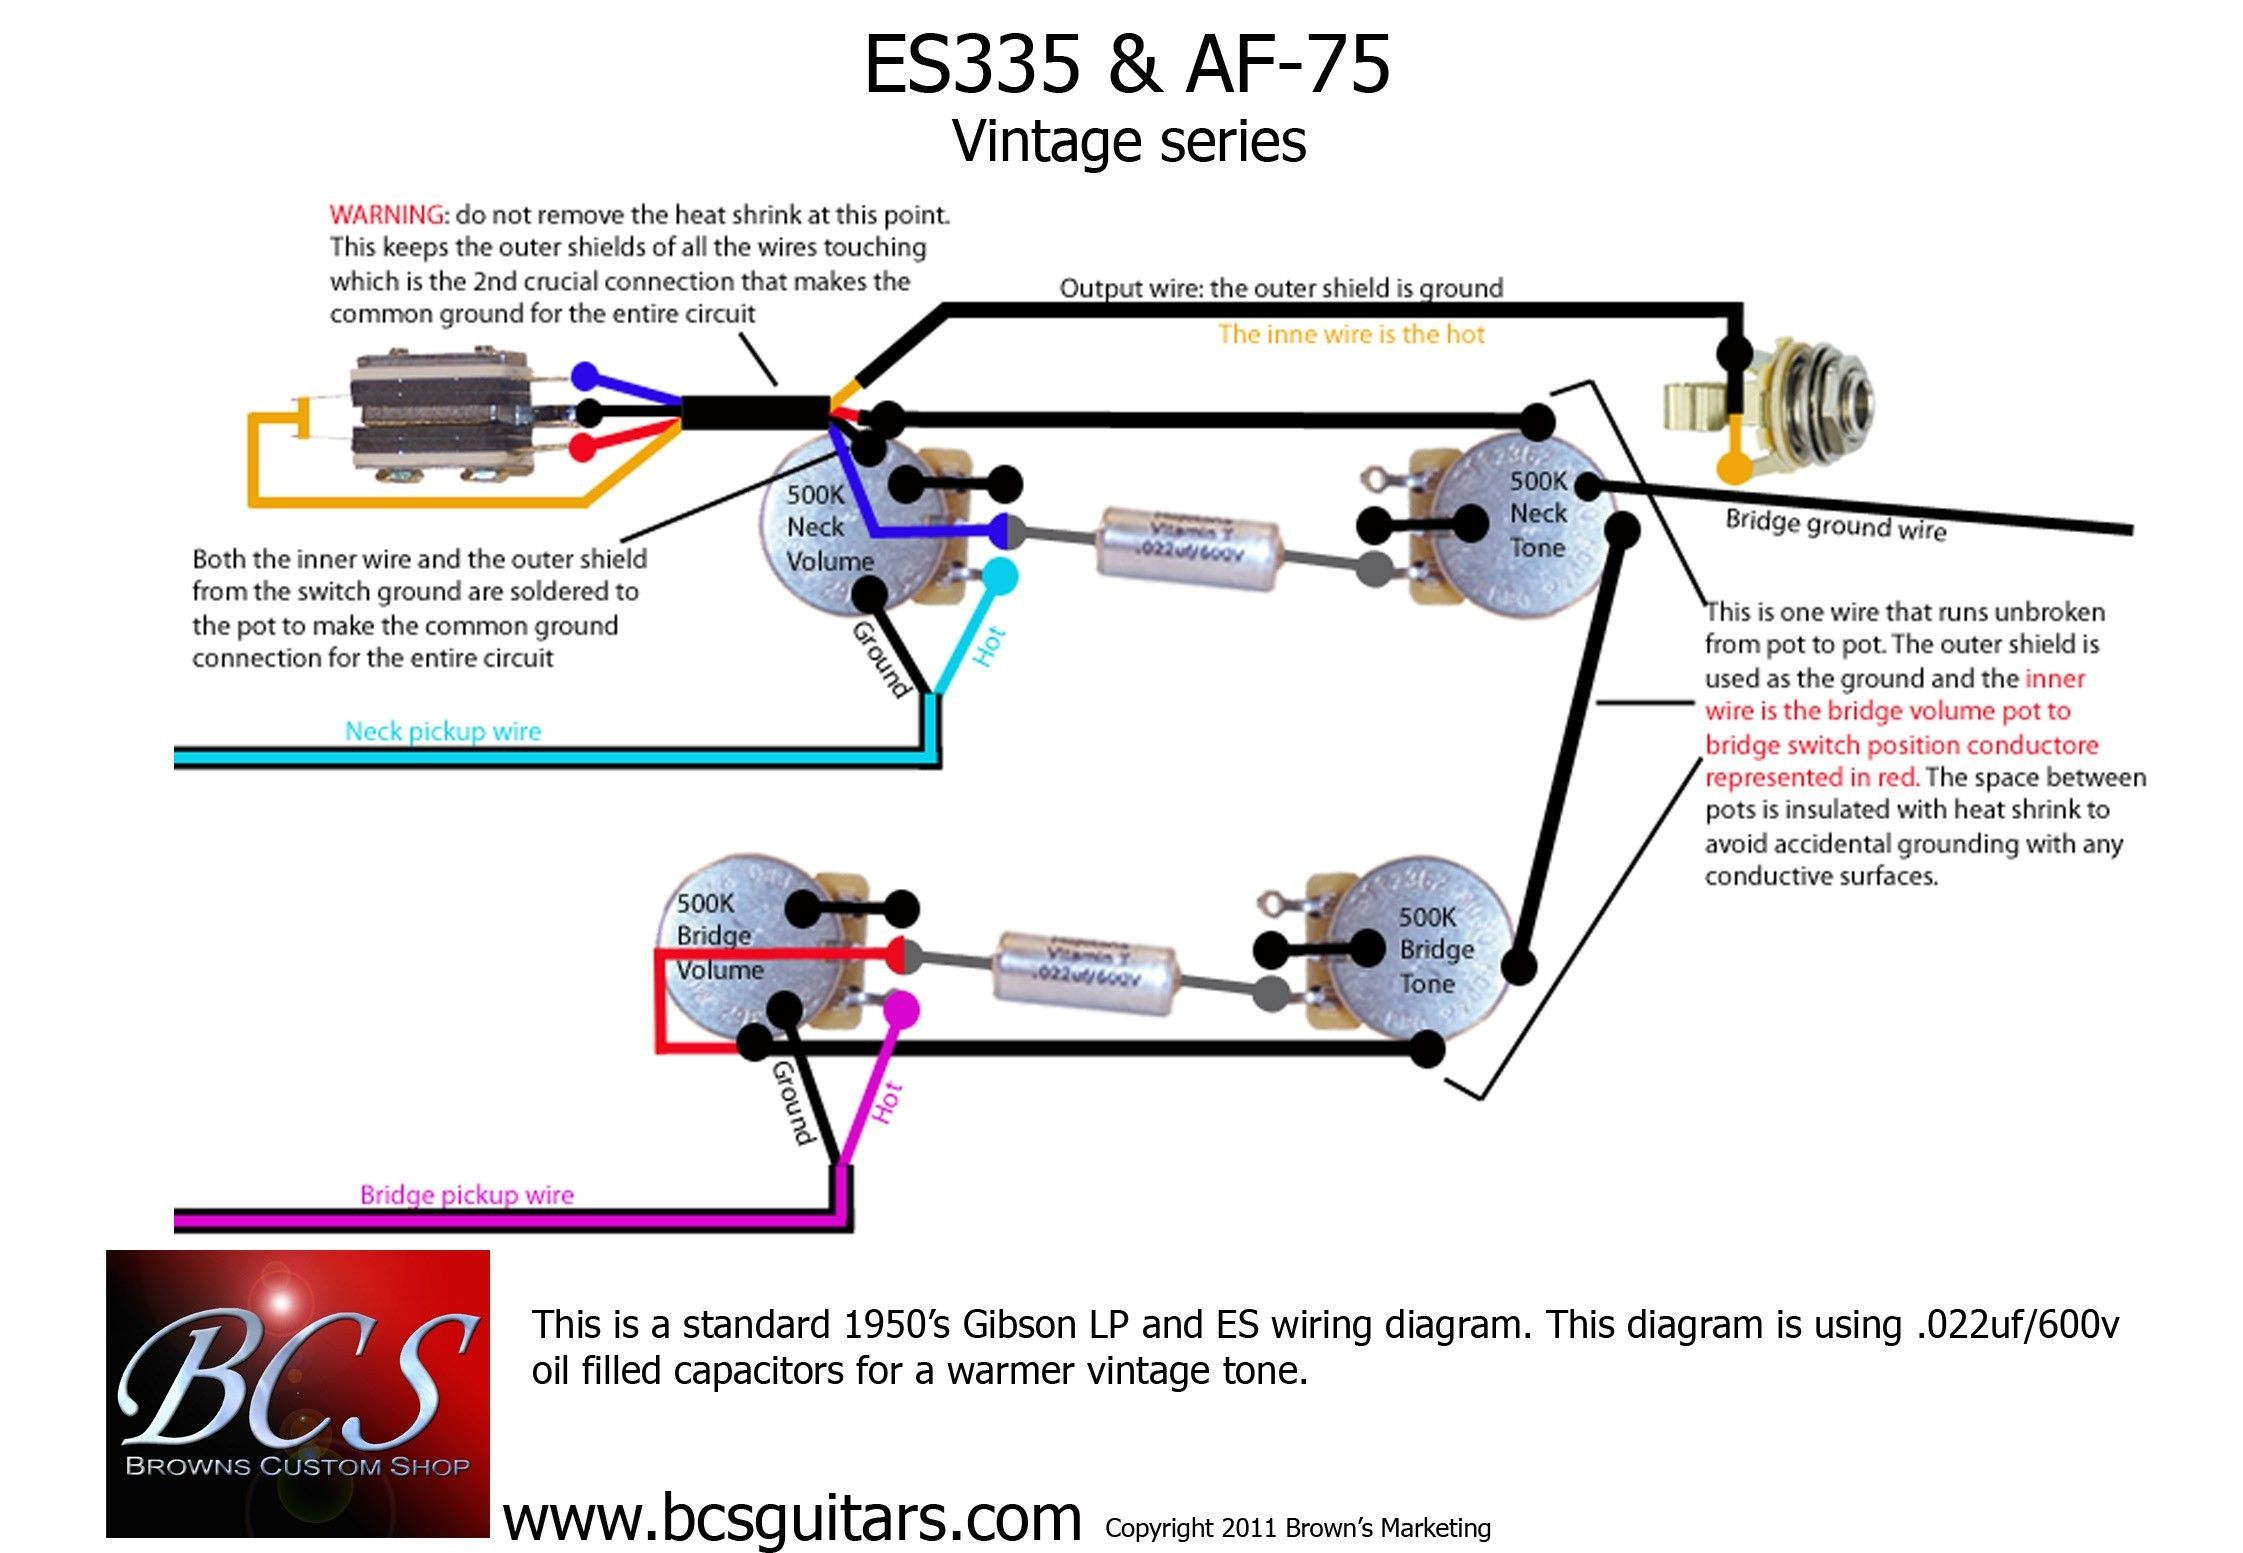 Unique Ovation Guitar Wiring Diagram Diagram Diagramsample Diagramtemplate Wiringdiagram Diagramchart Worksheet Worksheettemplate Proyectos